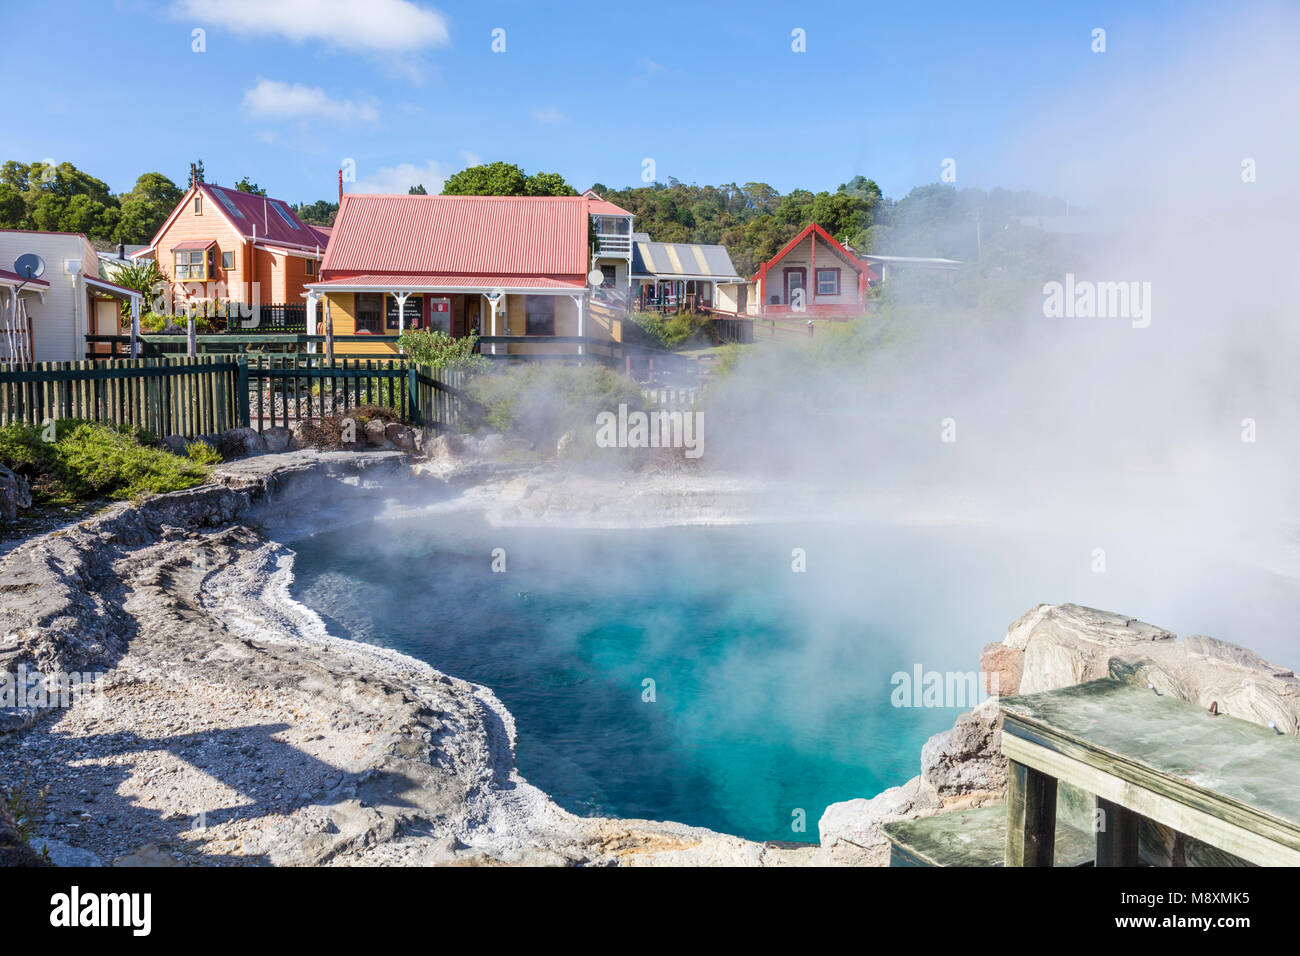 Nueva Zelanda ROTORUA Nueva Zelanda ROTORUA whakarewarewa Parekohuru piscina termal o ondulaciones asesina piscina Imagen De Stock